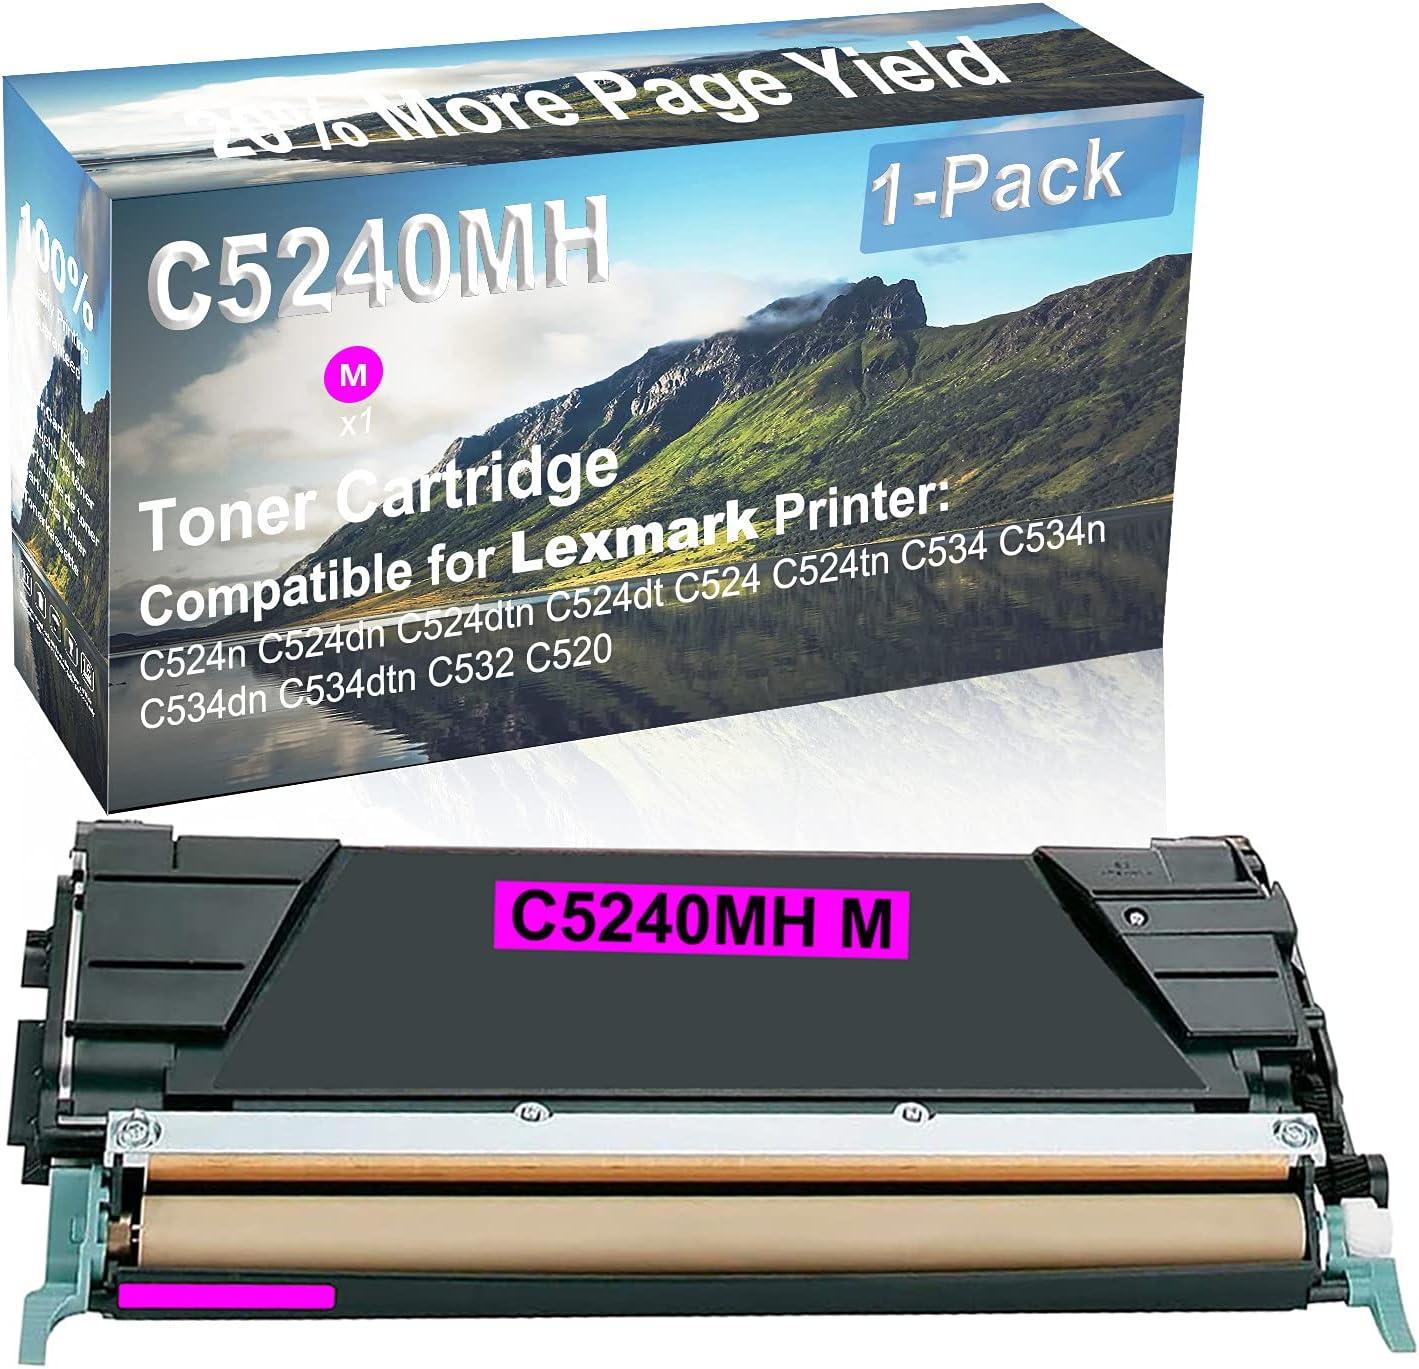 1-Pack (Magenta) Compatible High Yield C5240MH Laser Printer Toner Cartridge Used for Lexmark C534dn, C534dtn, C534dtn, C532, C520 Printer